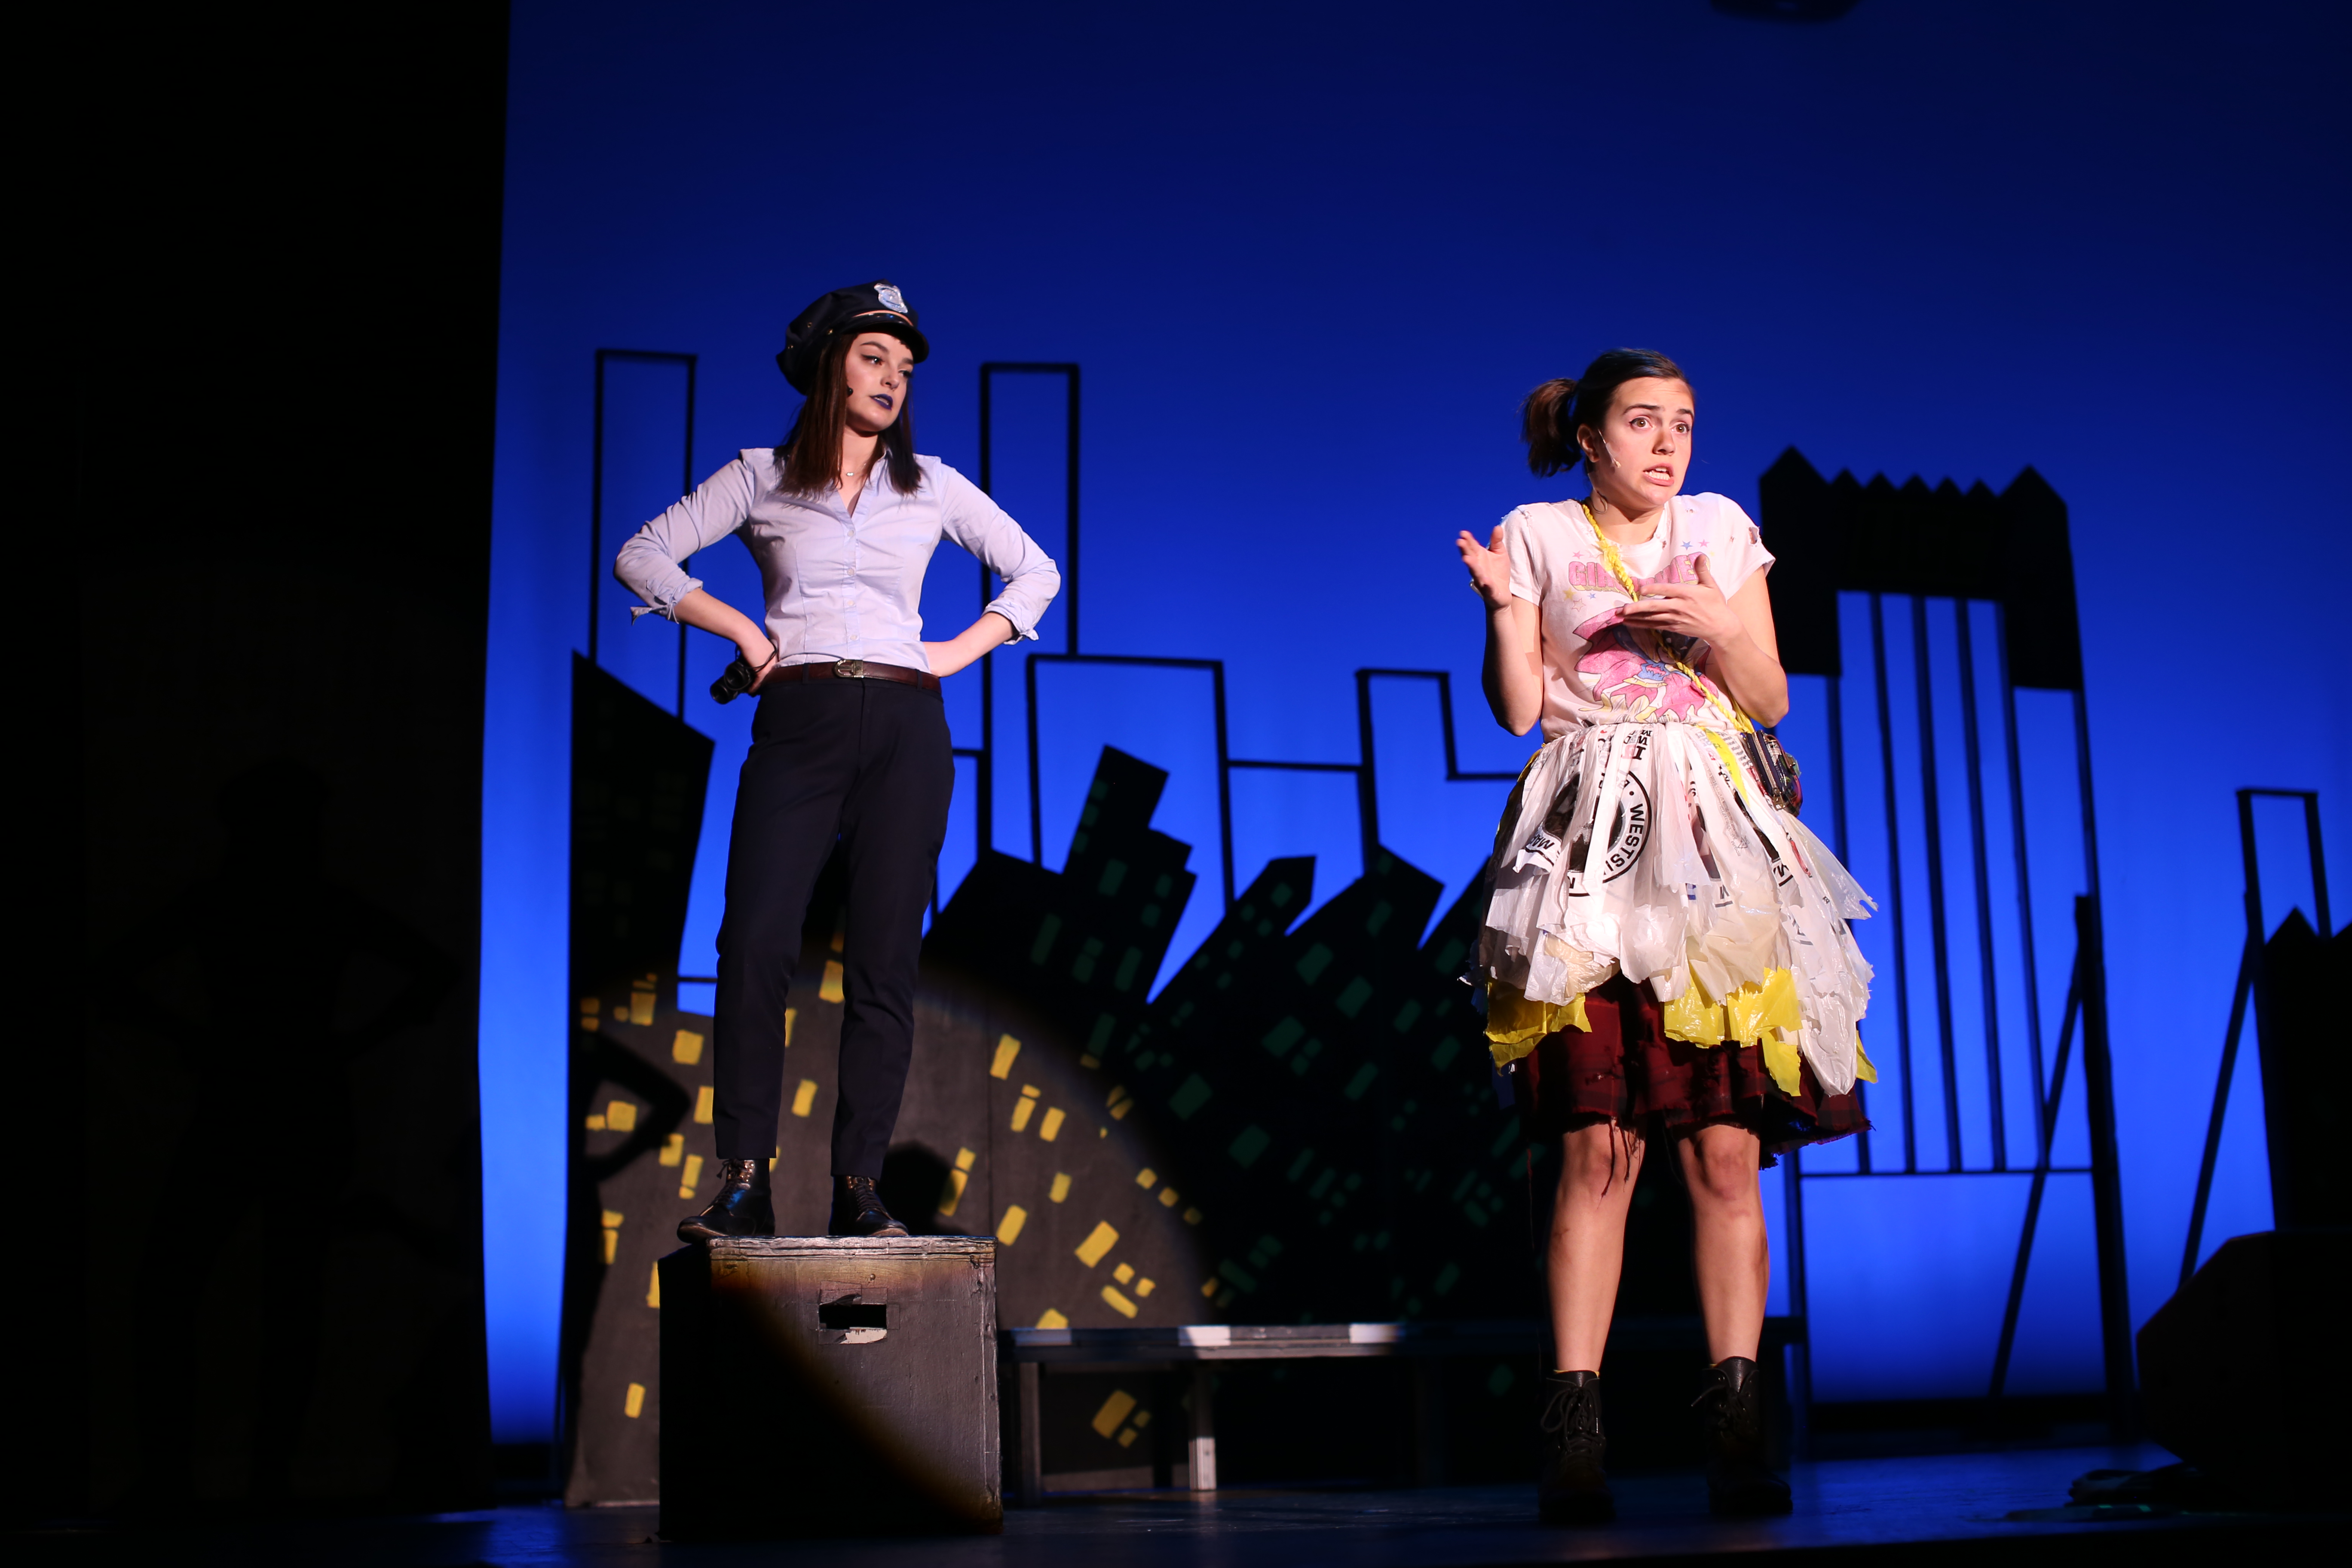 Urinetown: Maggie Vlietstra, Bernadette Bridges